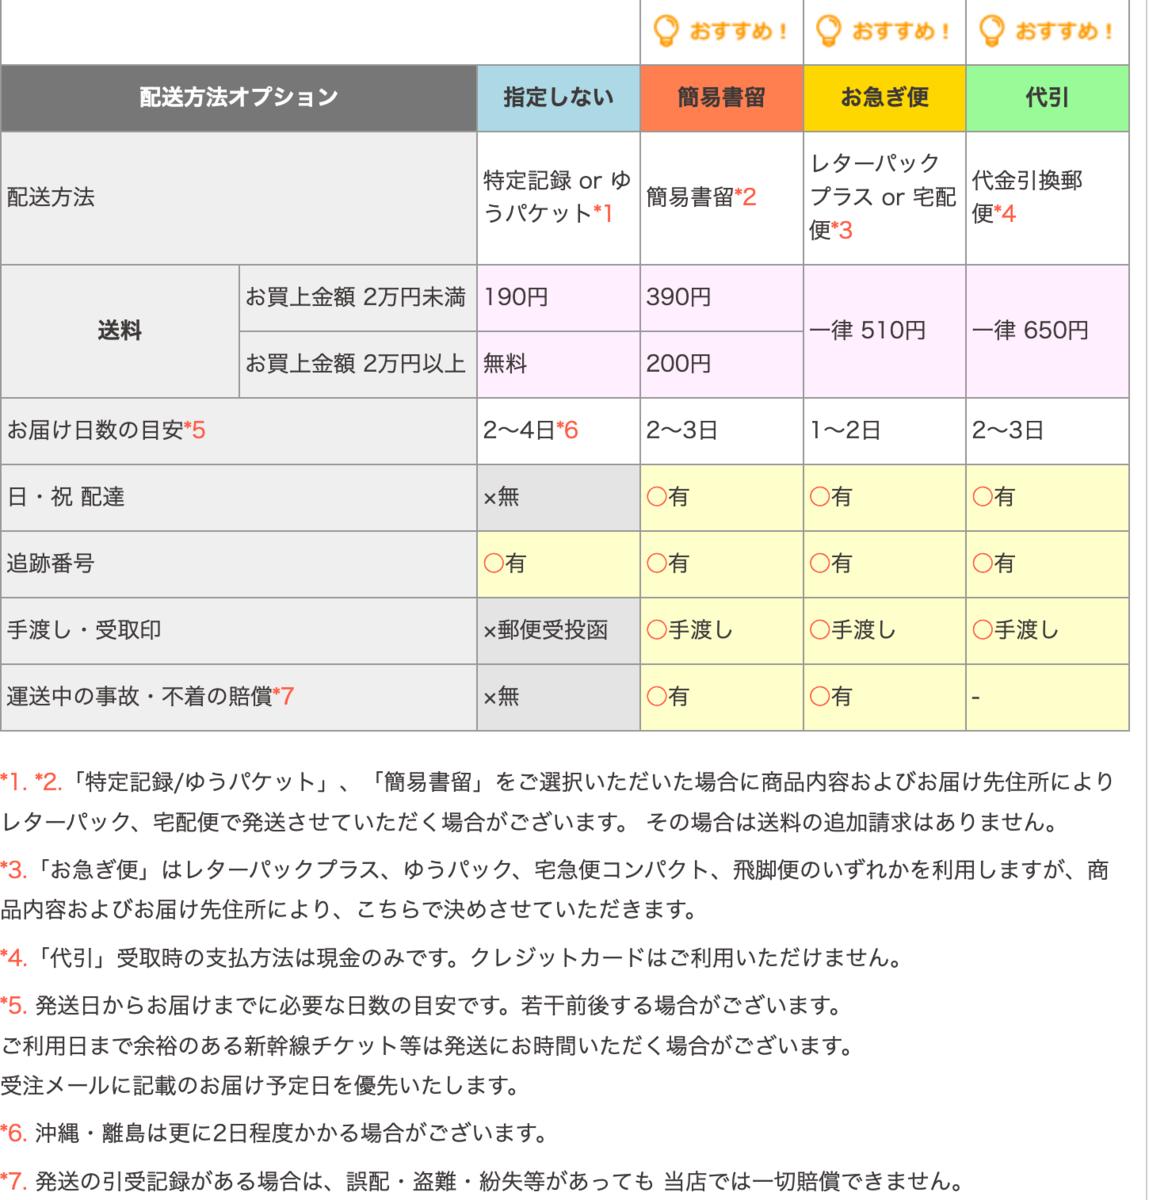 f:id:shihon79:20190818123901p:plain